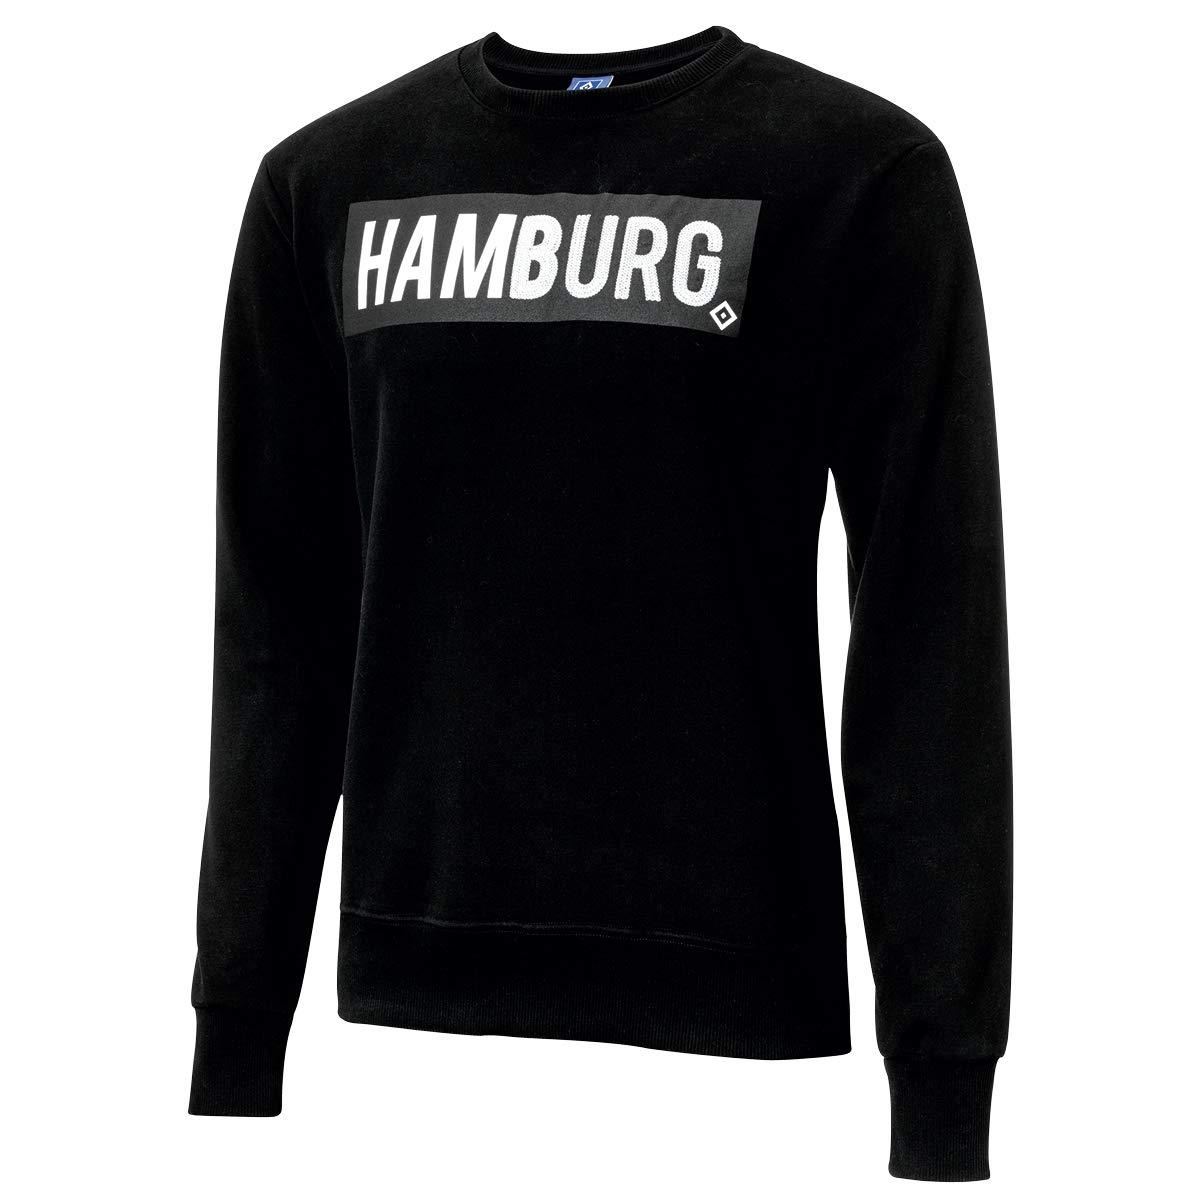 M 4XL Hamburger SV HSV Sweatshirt S/önke Gr